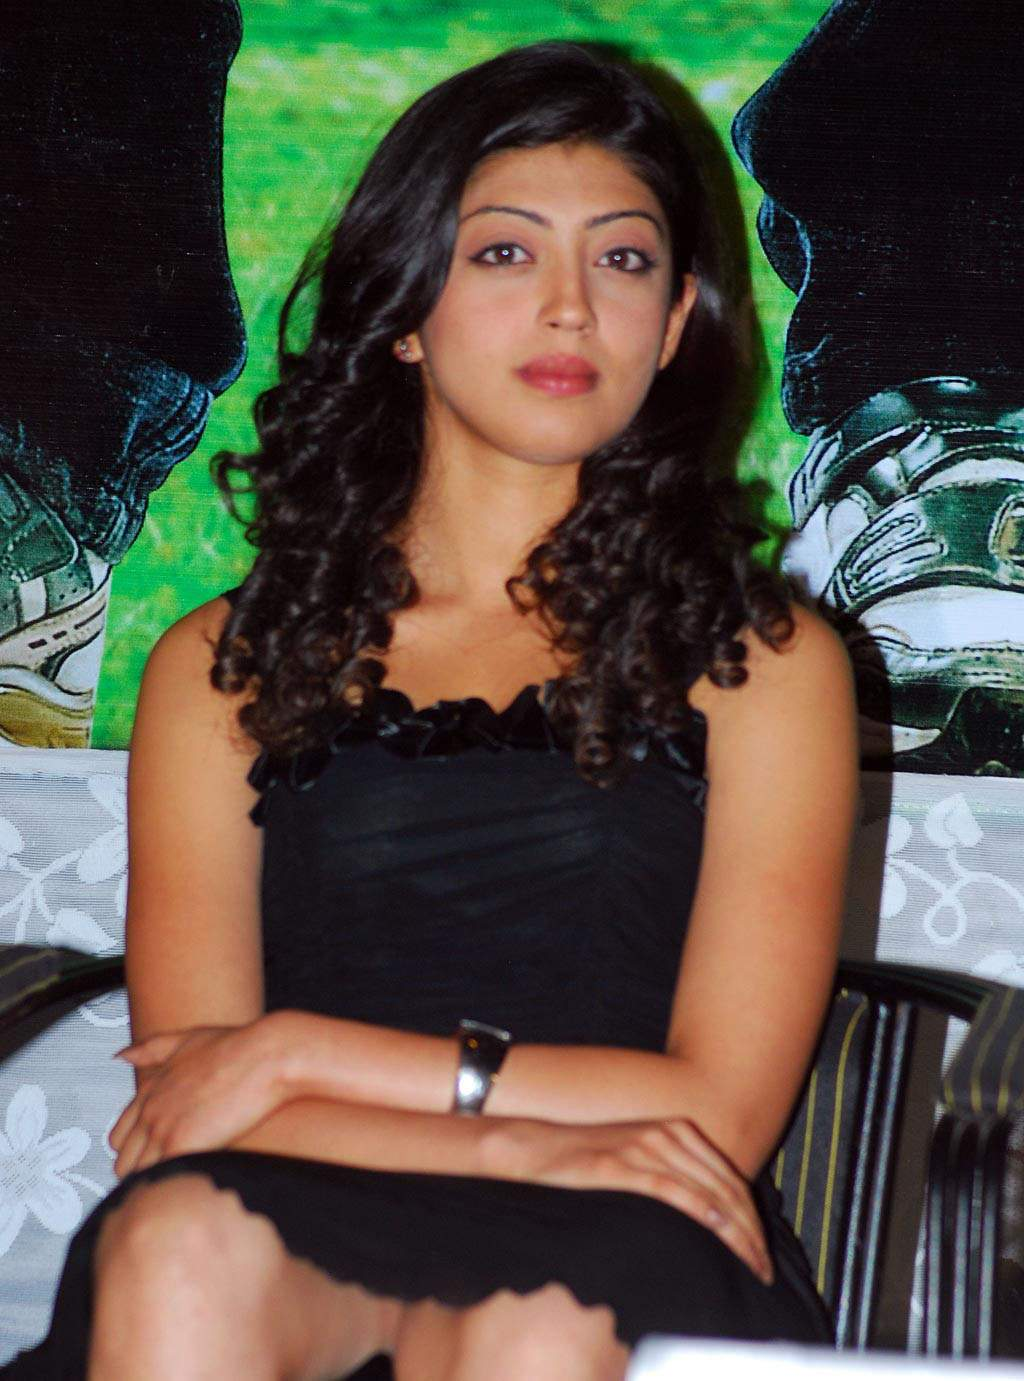 Telugu Actress Pranitha Hot Photos Gallery - Indian Film -3042